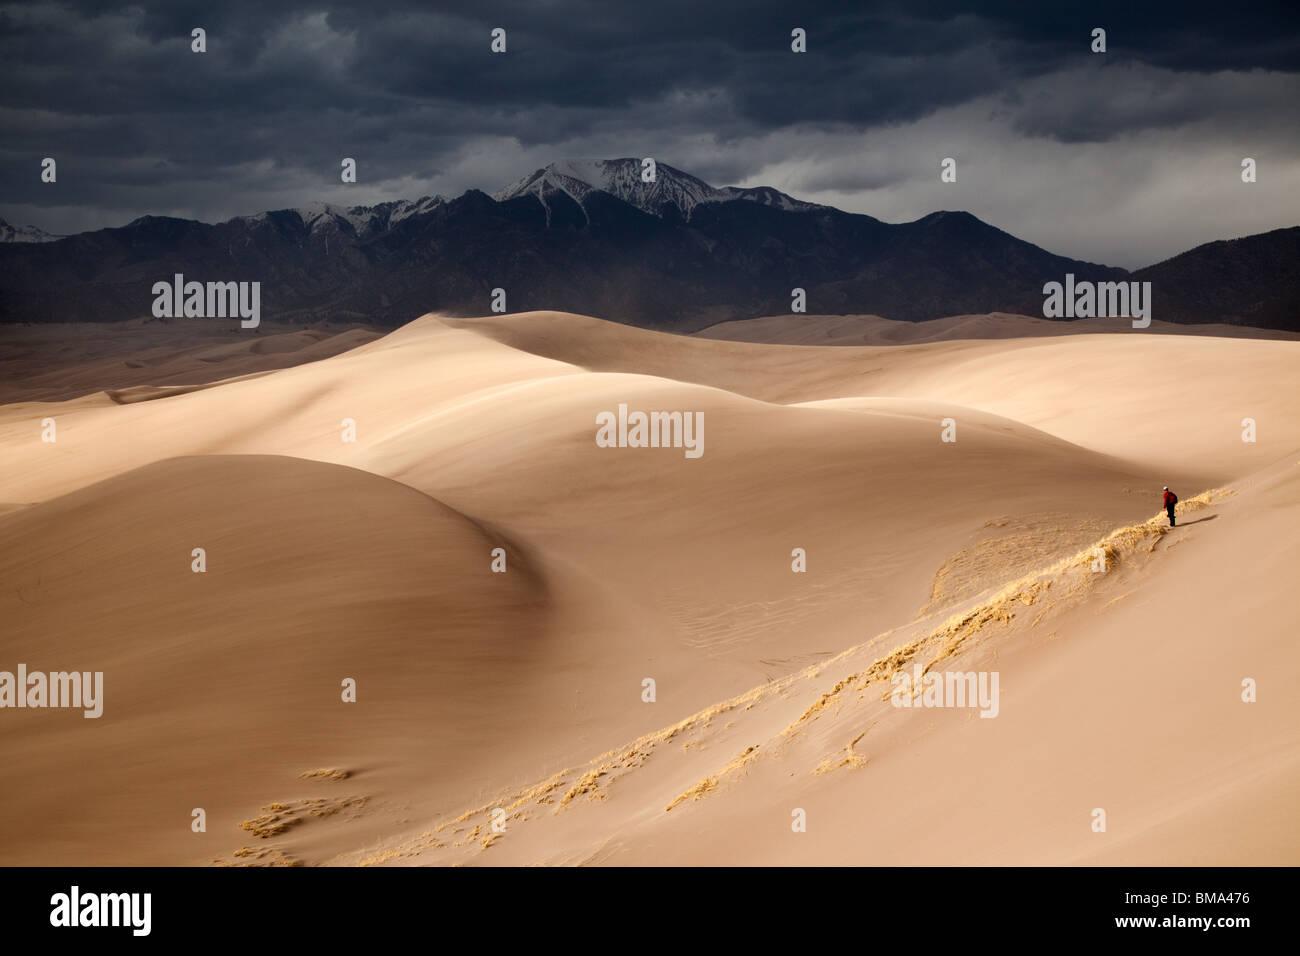 Dunefield and Sangre De Cristo Mountains, Great Sand Dunes National Park, Colorado Stock Photo